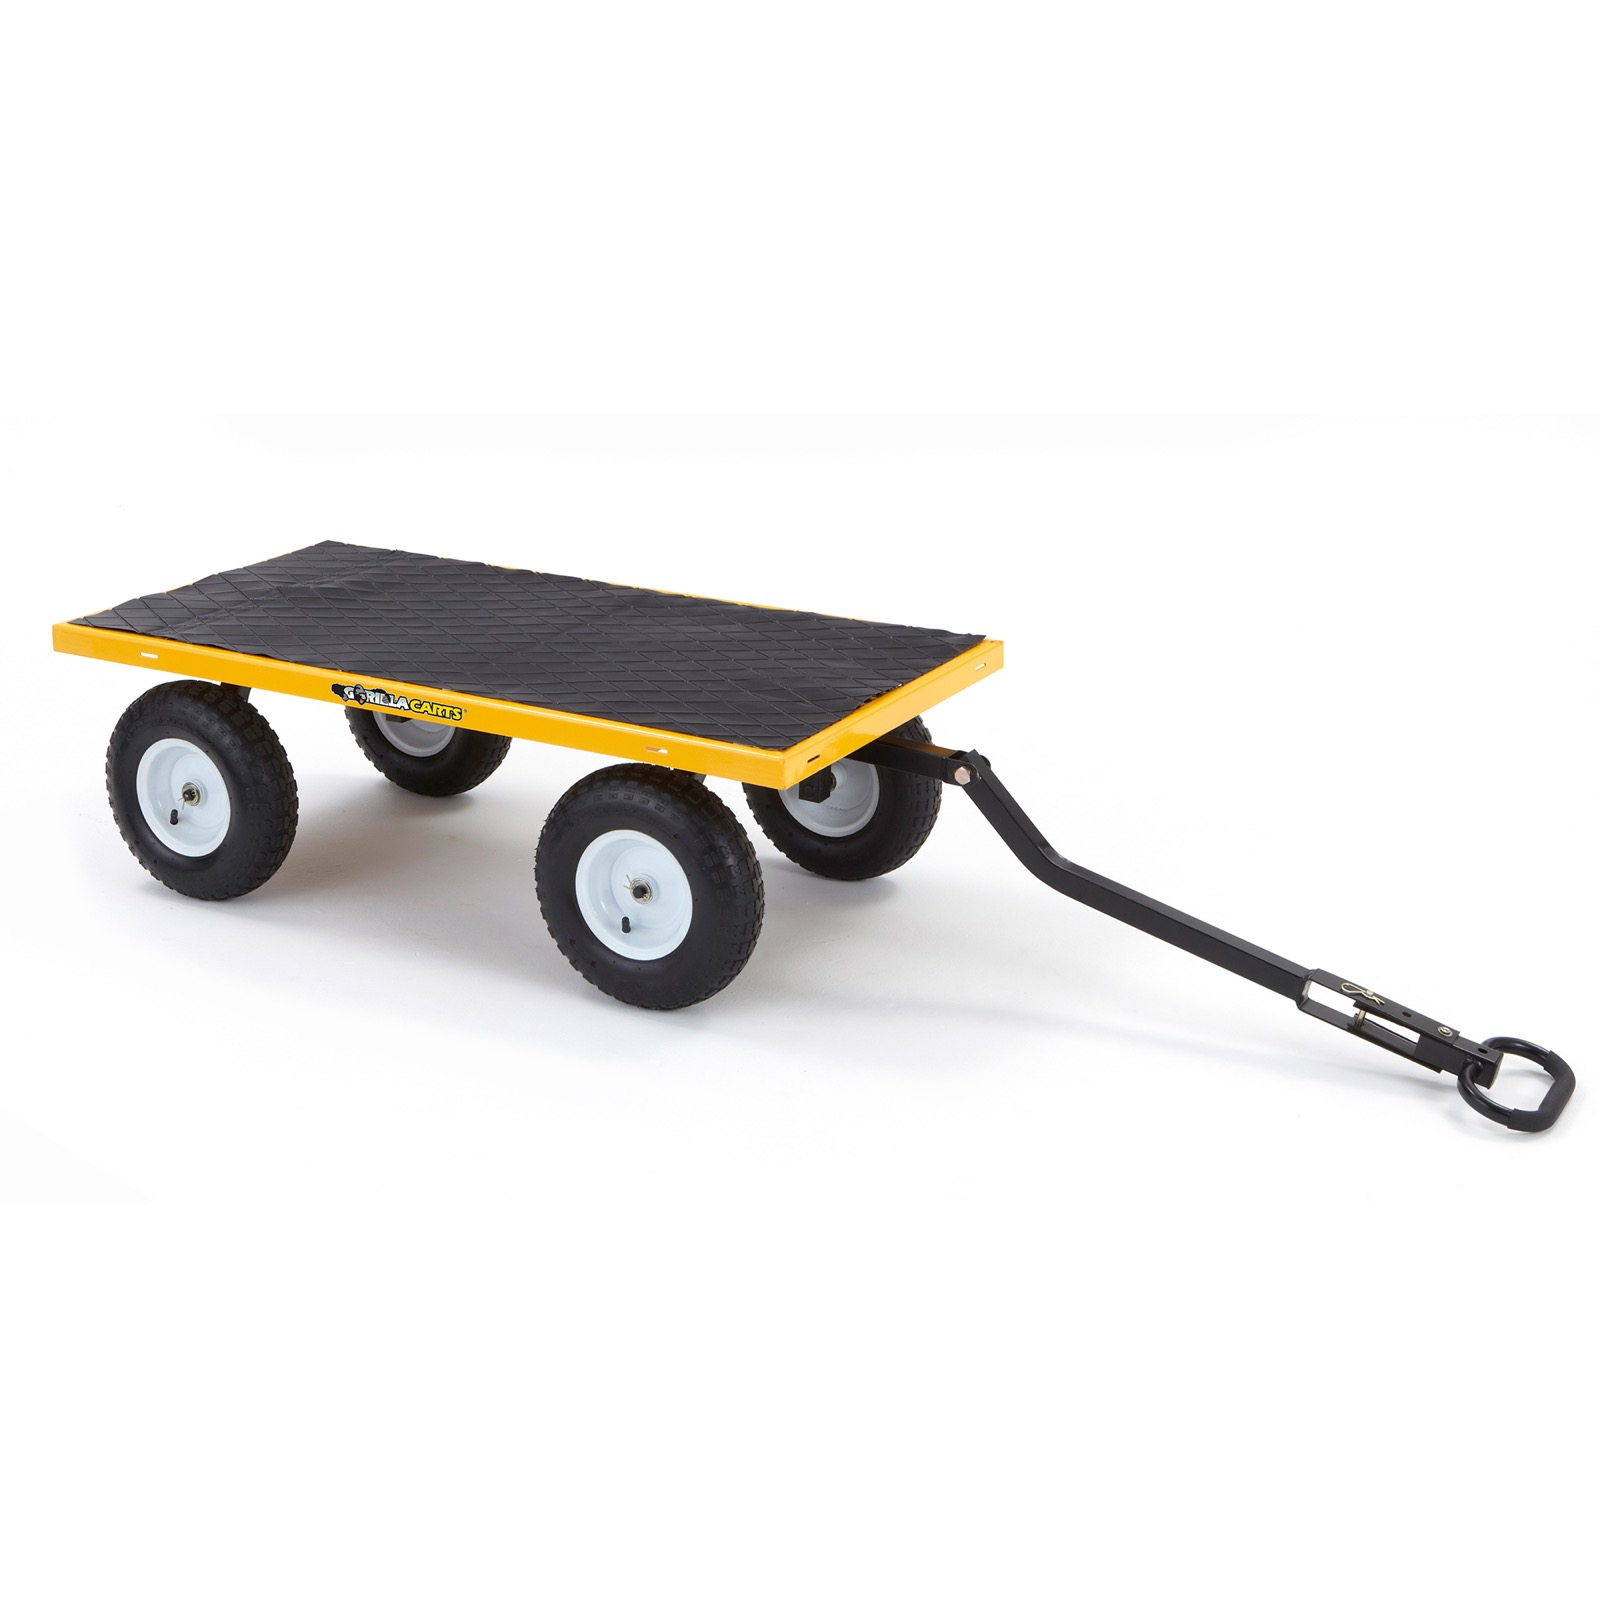 Gor1201b Gorilla Carts